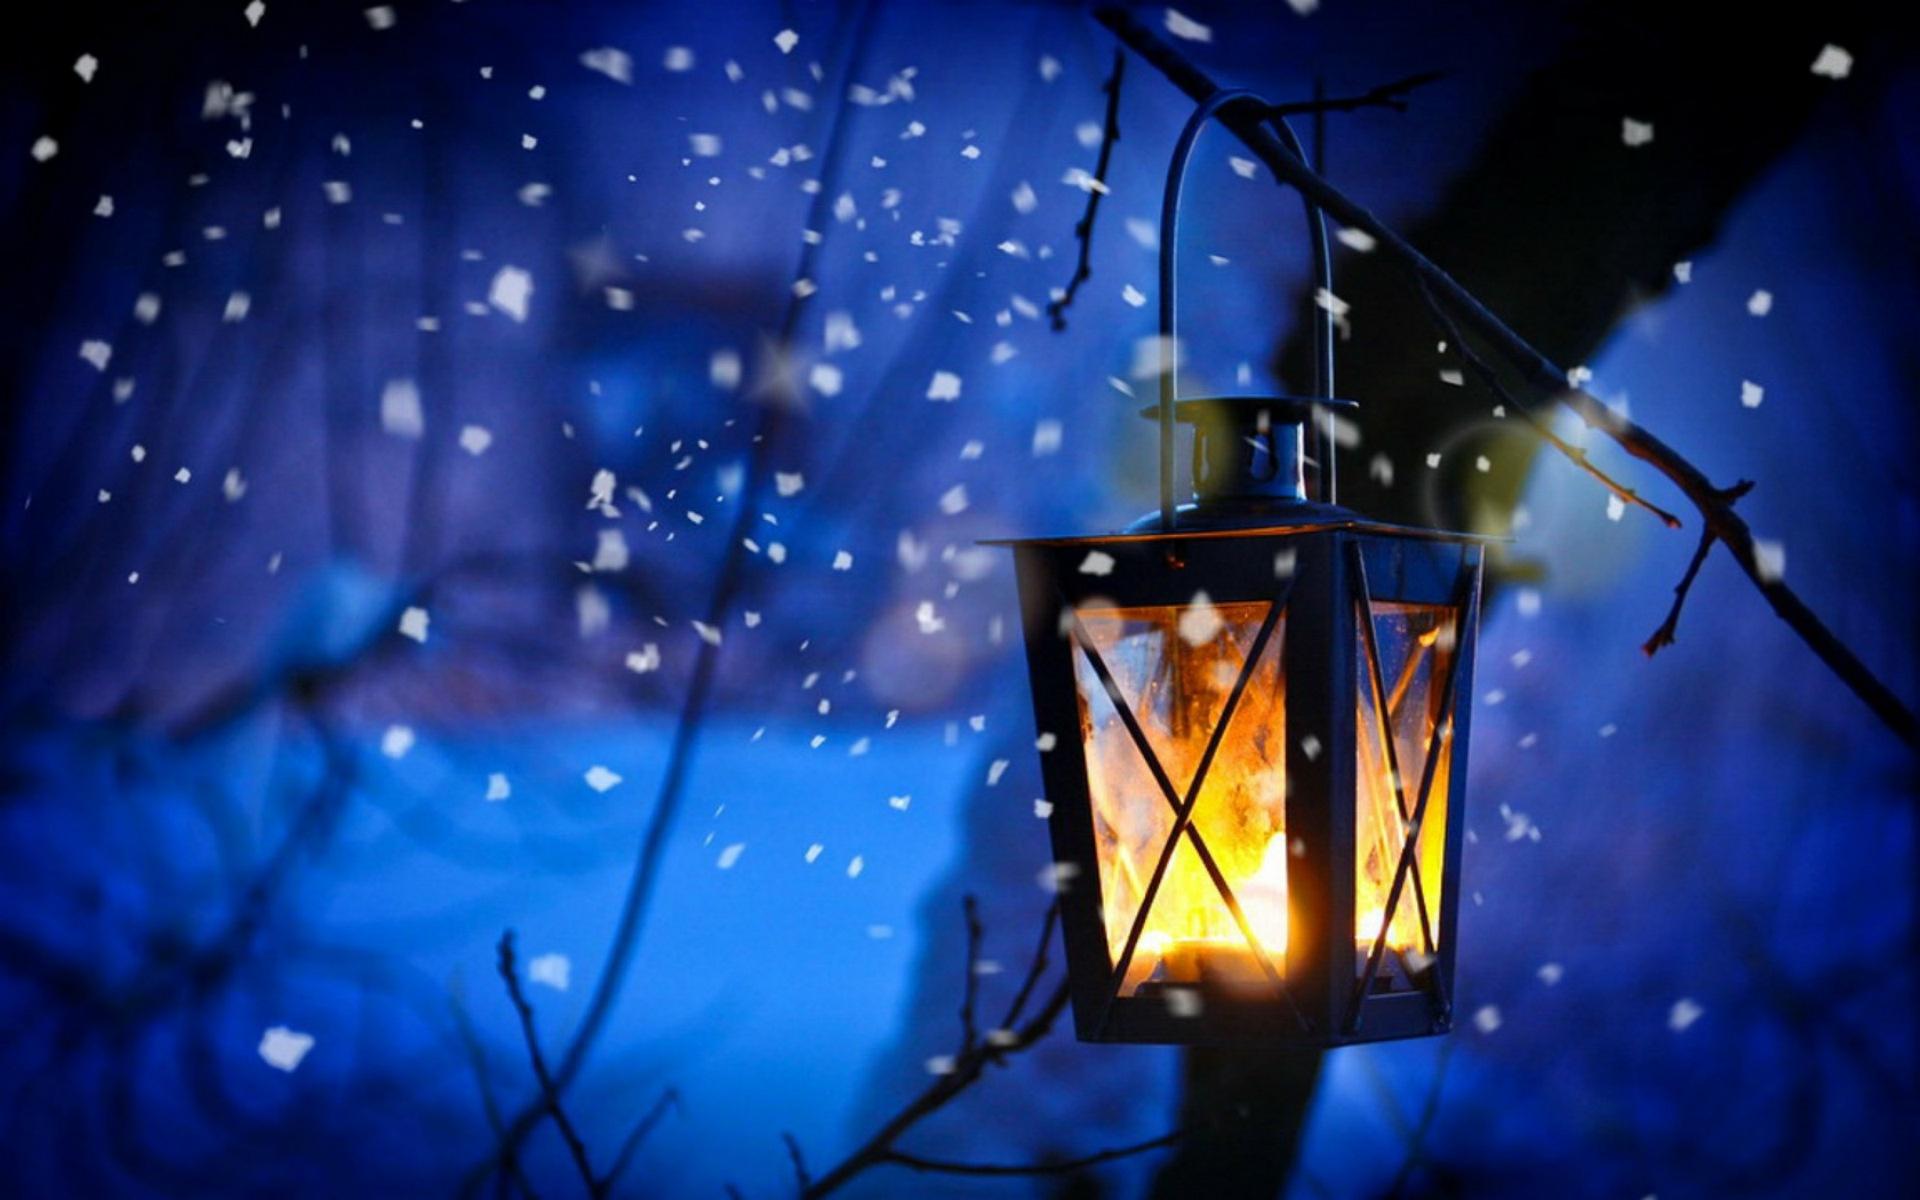 Креативные снеговики фото никита уже